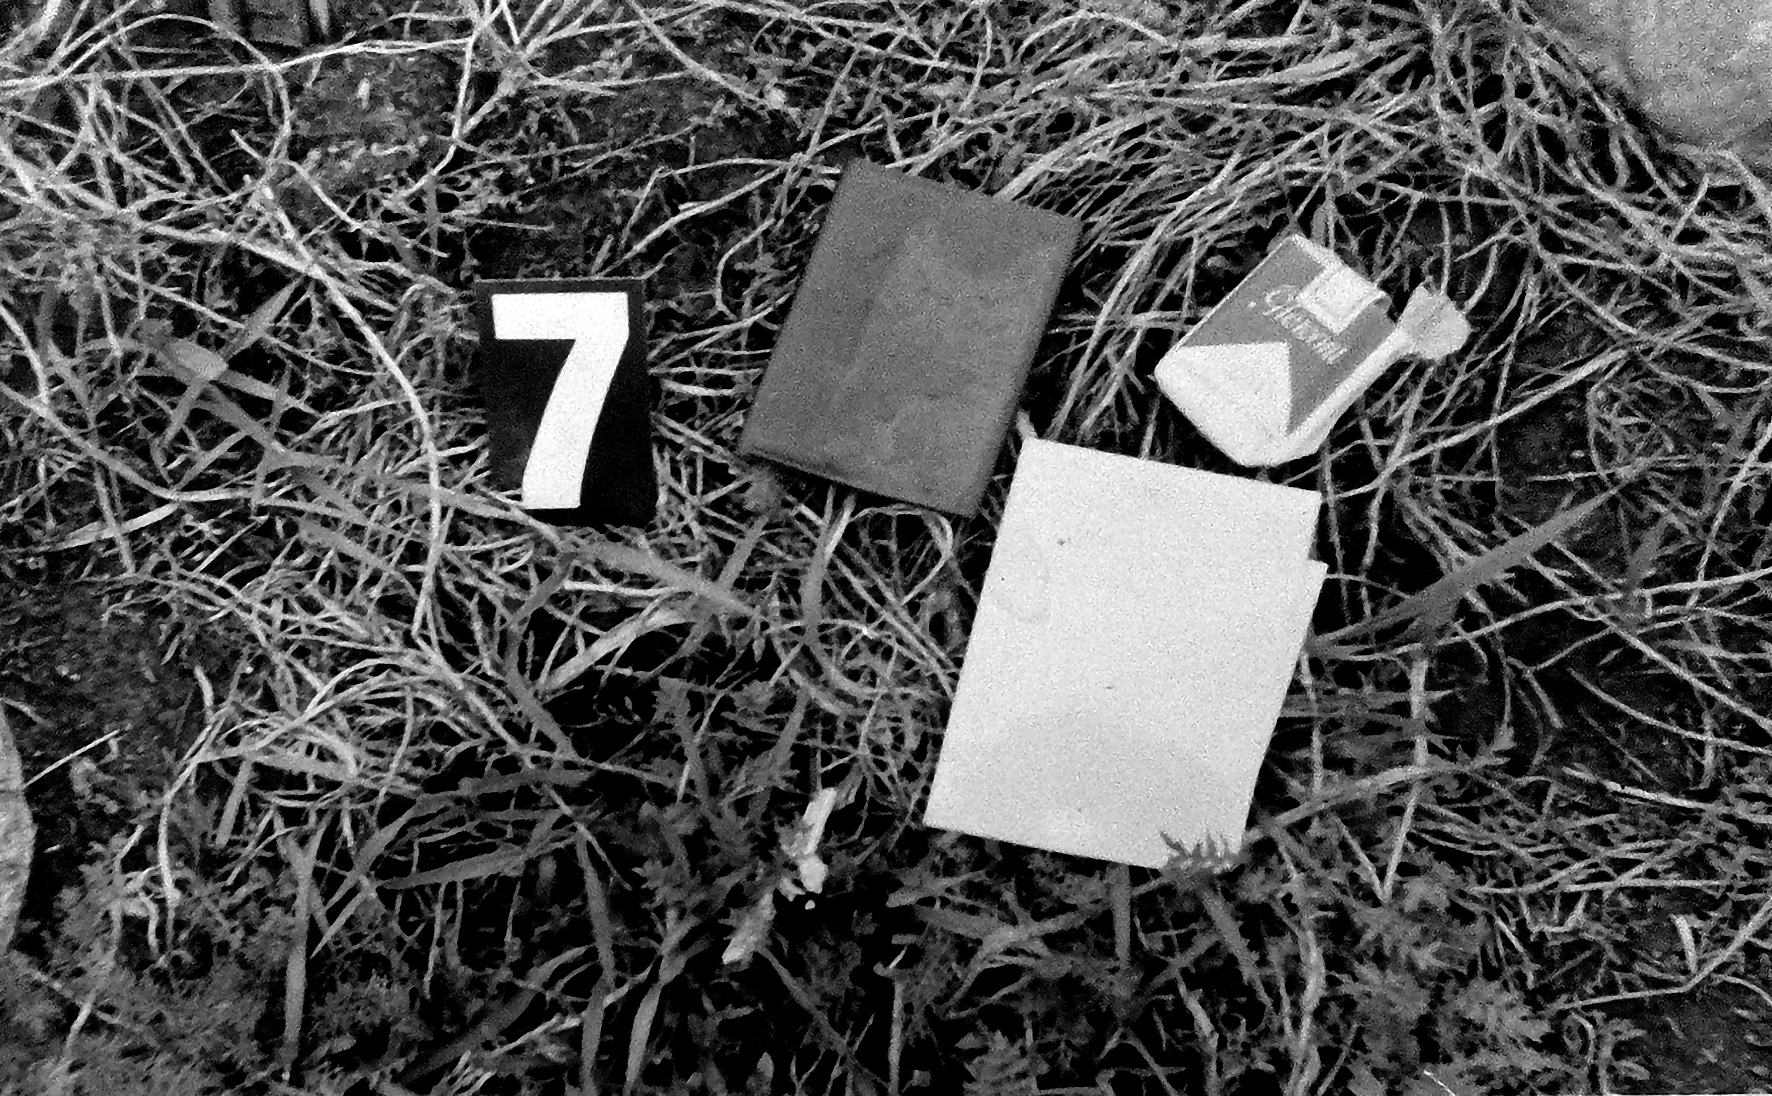 Materiały ze śledztwa (fot. Krzysztof Wójcik)